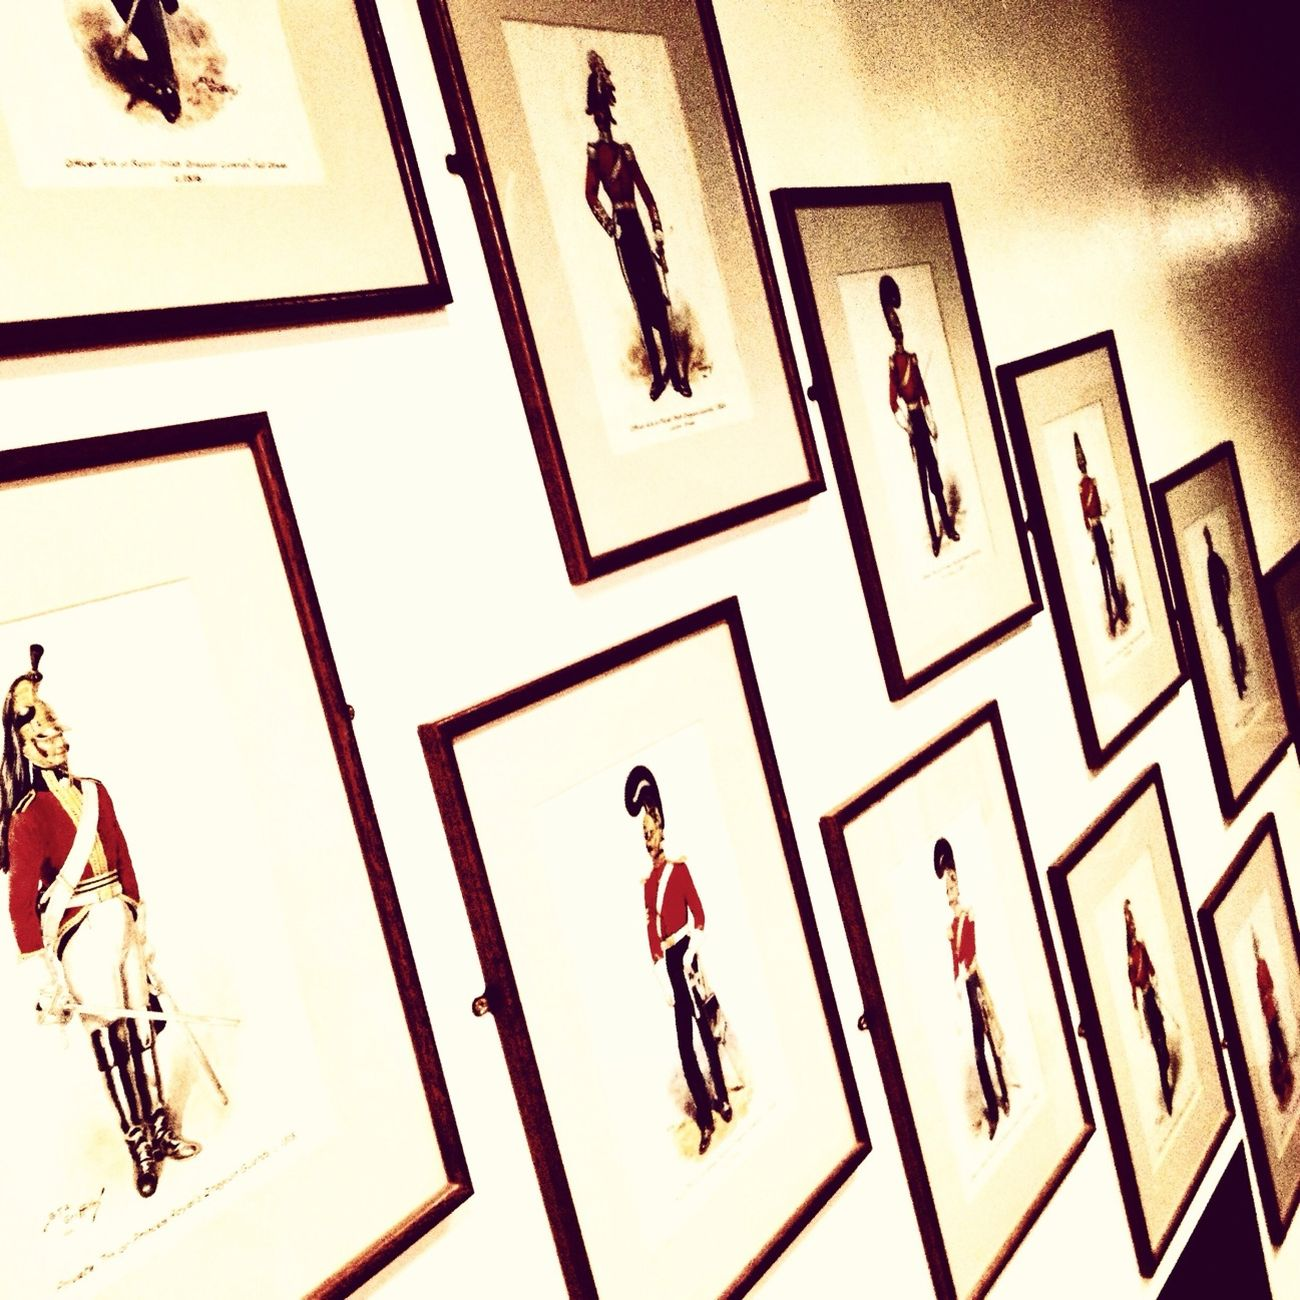 Wall Of Uniform